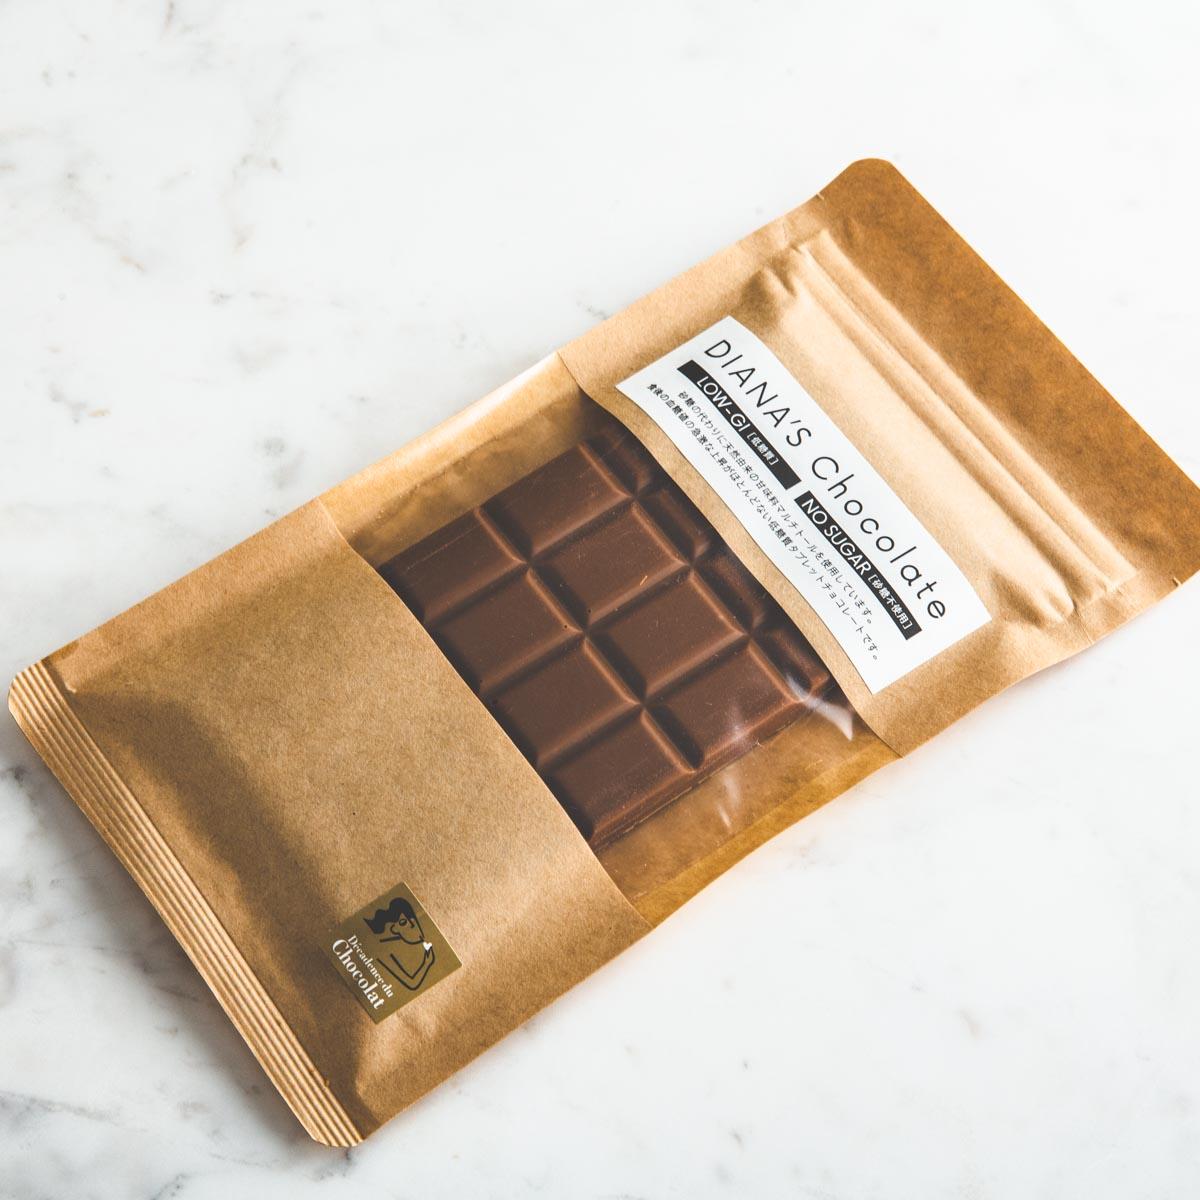 LOW-GI・ディアナチョコレート【ミルク】